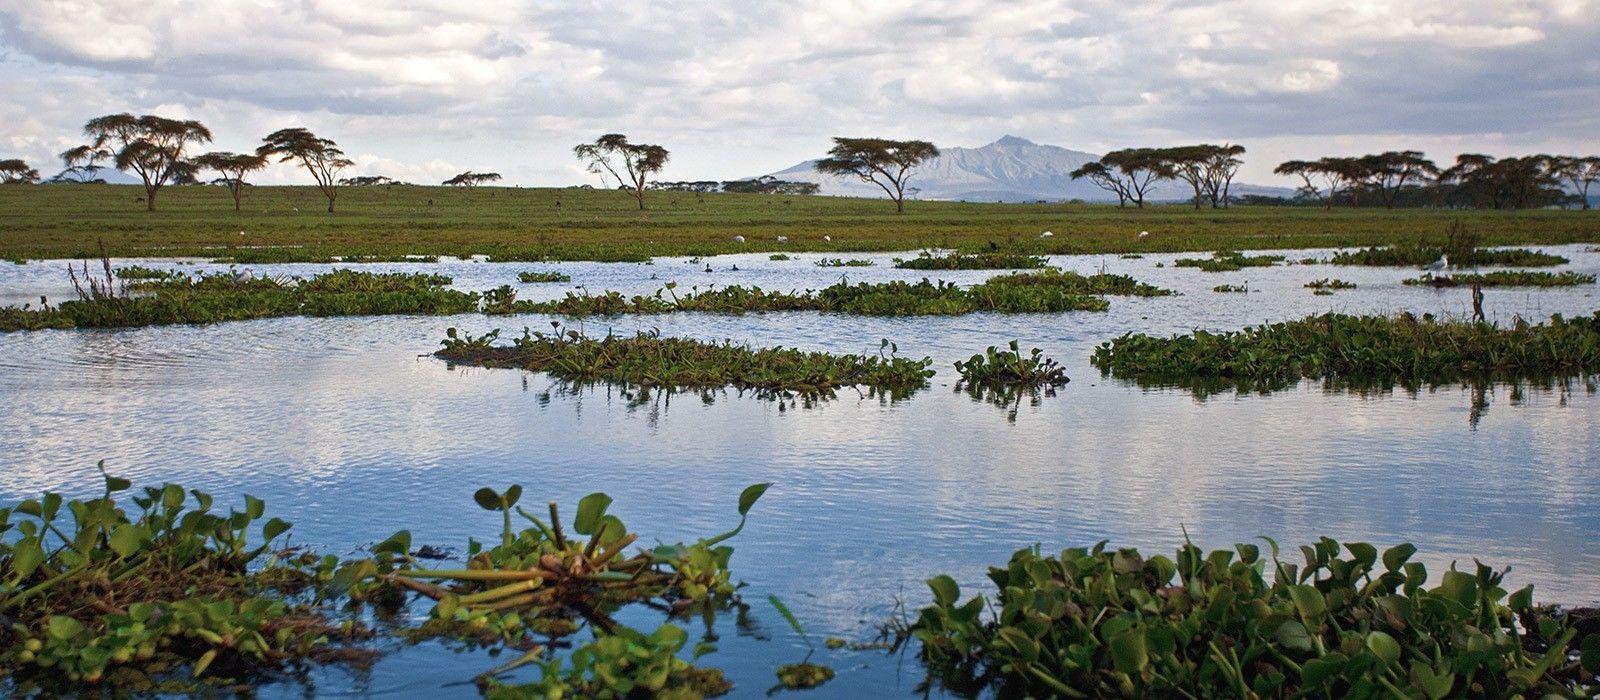 Masai Mara, Meru & Diani Beach – Safari & Strand in Kenia Urlaub 3